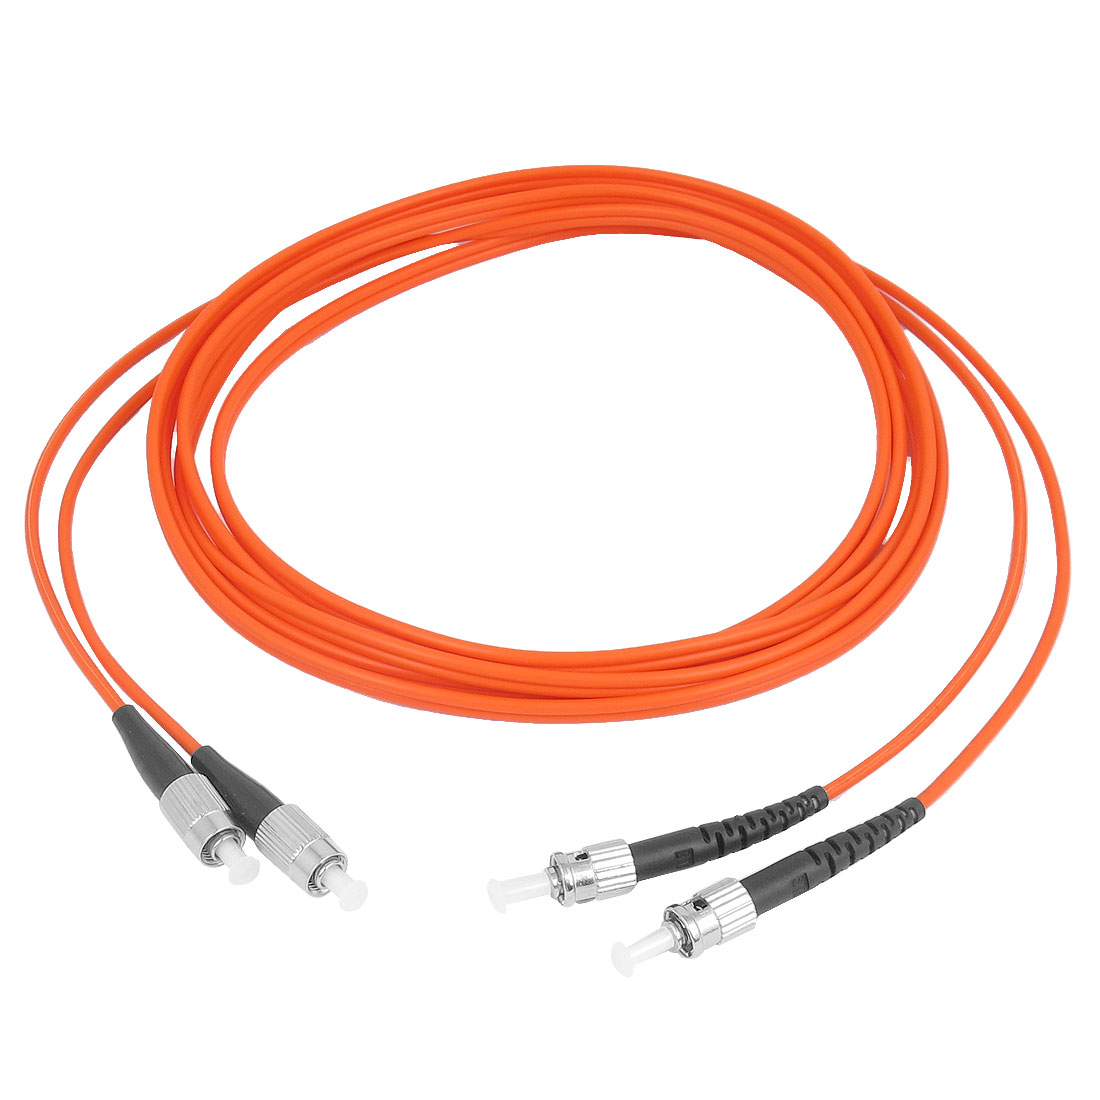 Jumper Cable Duplex Multimode FC-ST Fiber Optic Patch Cord 3 Meters Orange